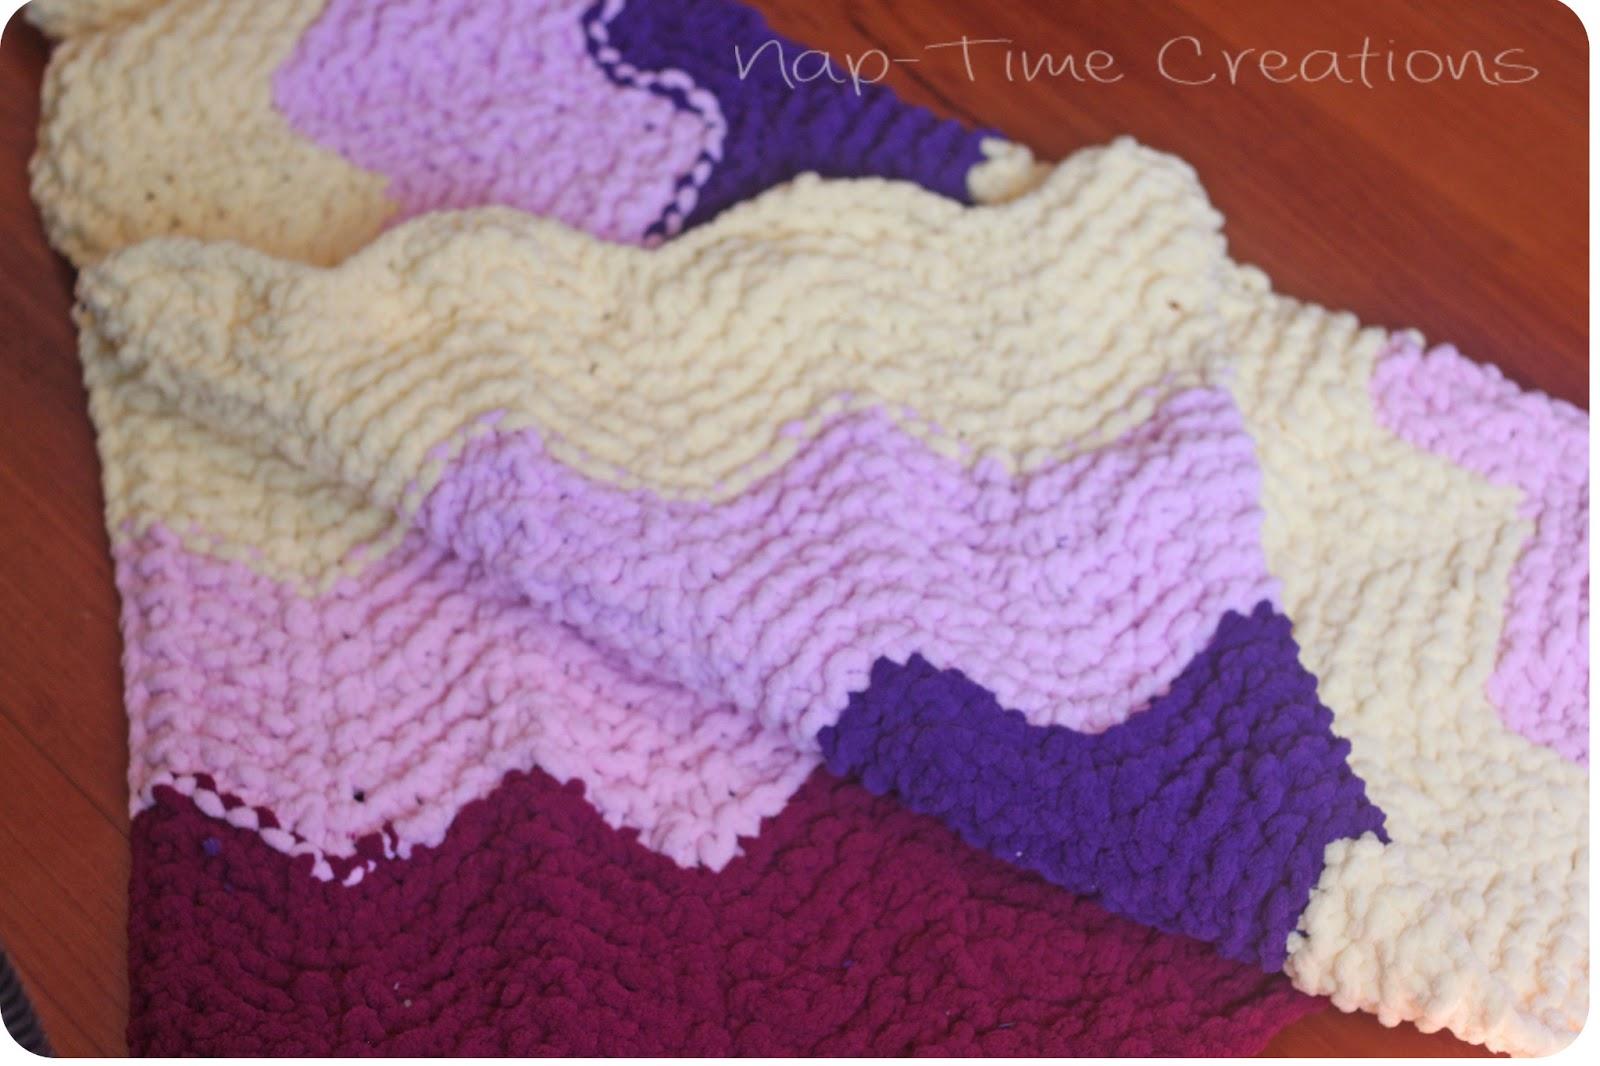 Chevron Knitted Baby Blanket Pattern : Chevron Baby Blanket {free knitting pattern} - Life Sew Savory